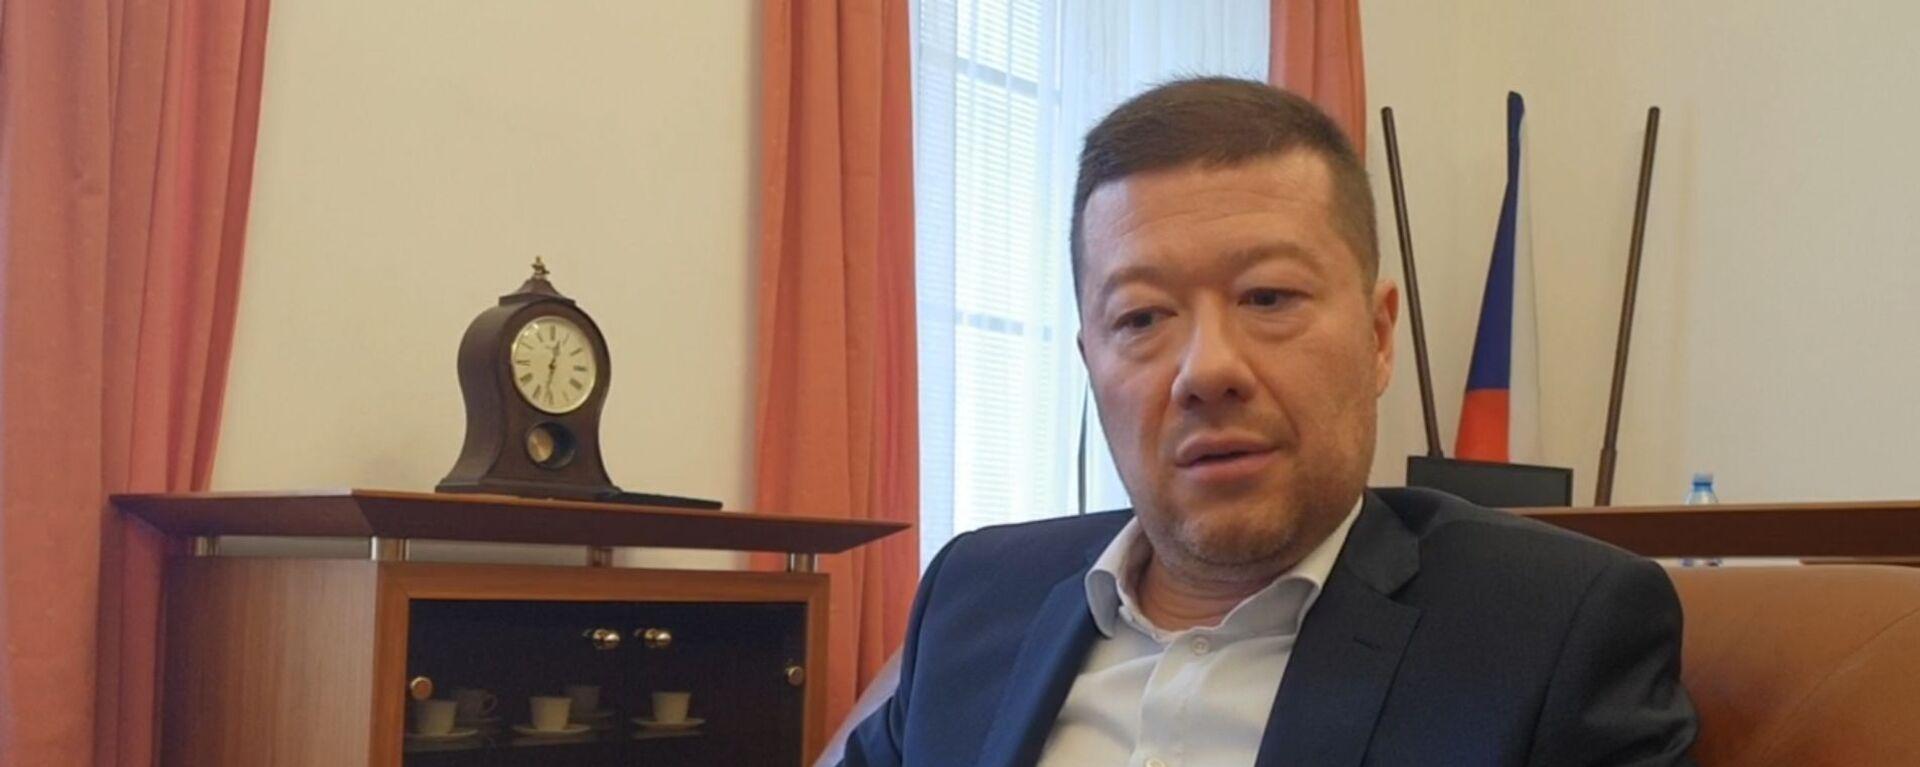 Předseda SPD Tomio Okamura - Sputnik Česká republika, 1920, 01.09.2021